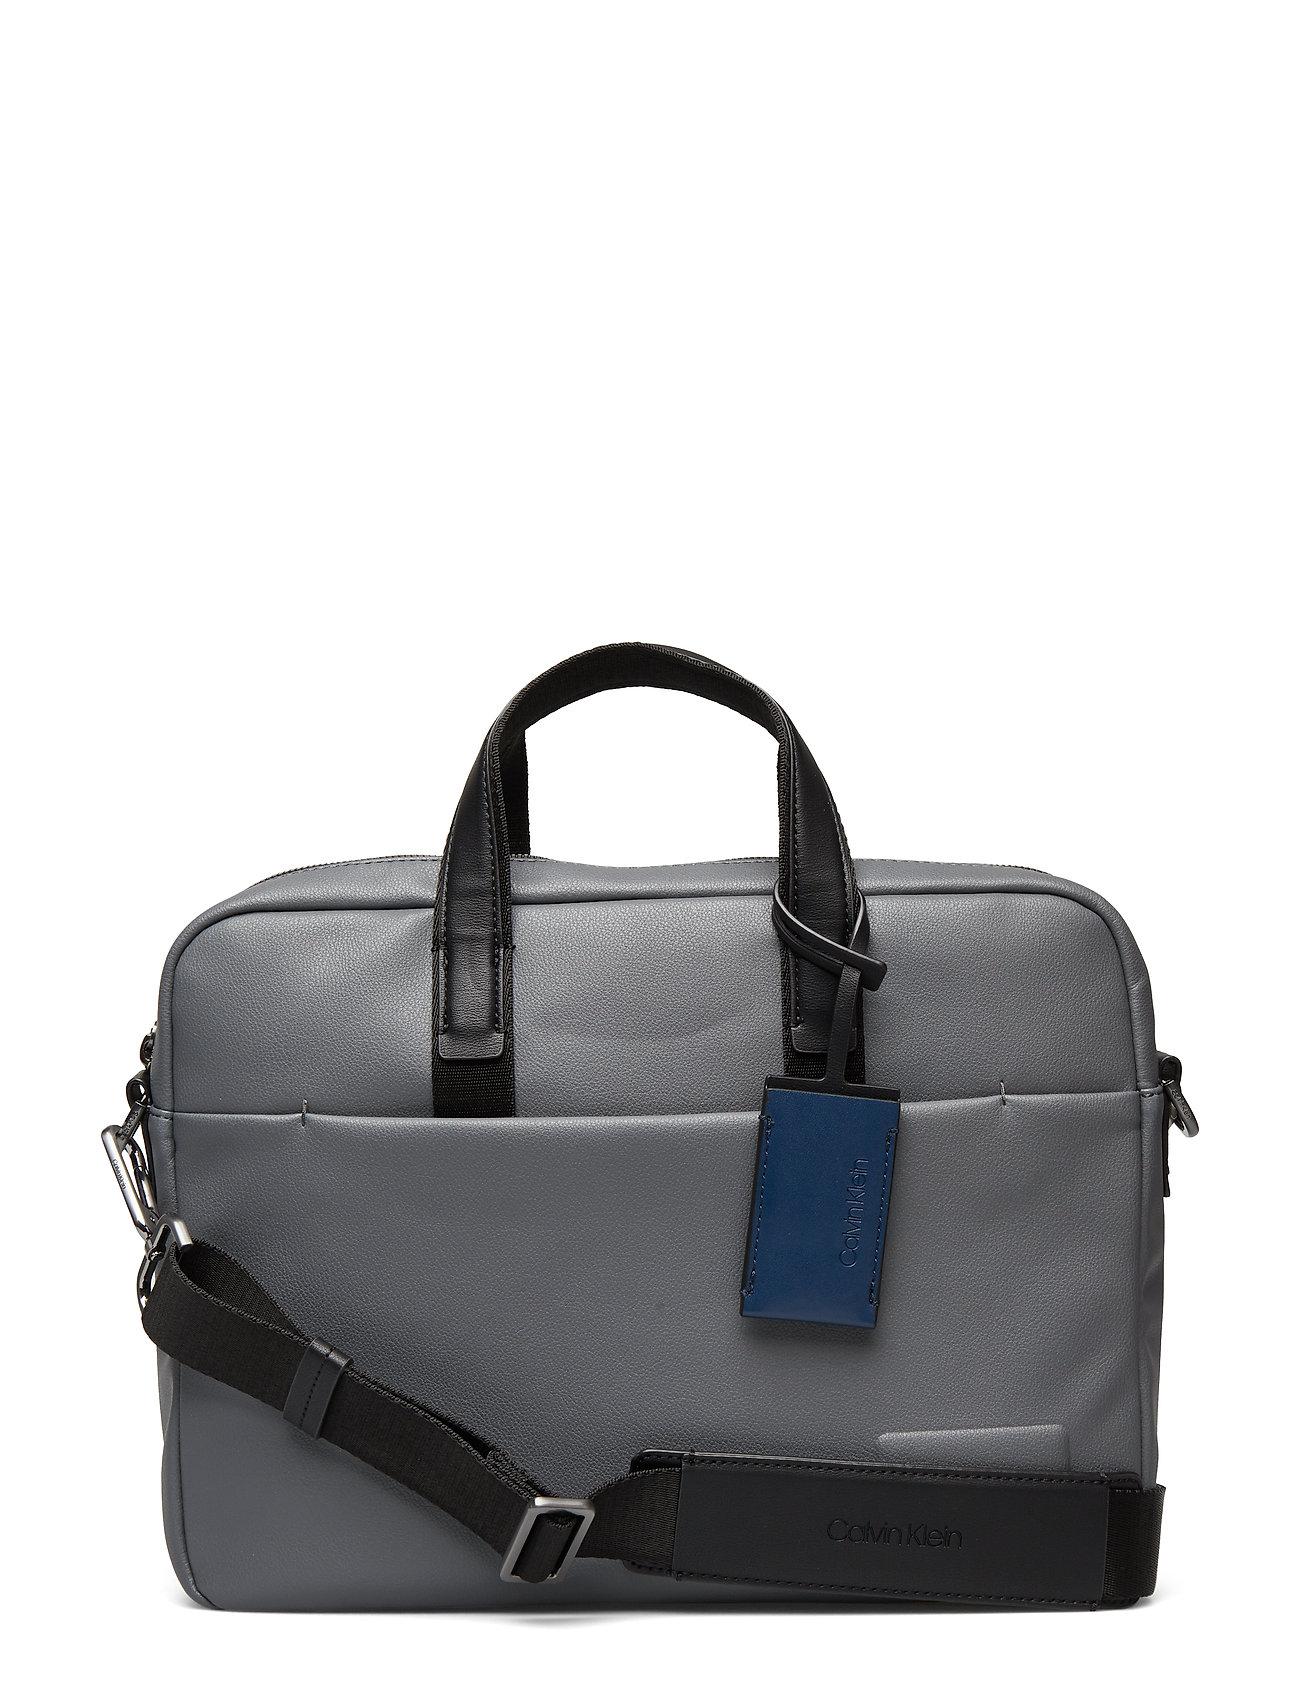 Calvin Klein TASK FORCE 1 GUSSET - STEEL GREYSTONE